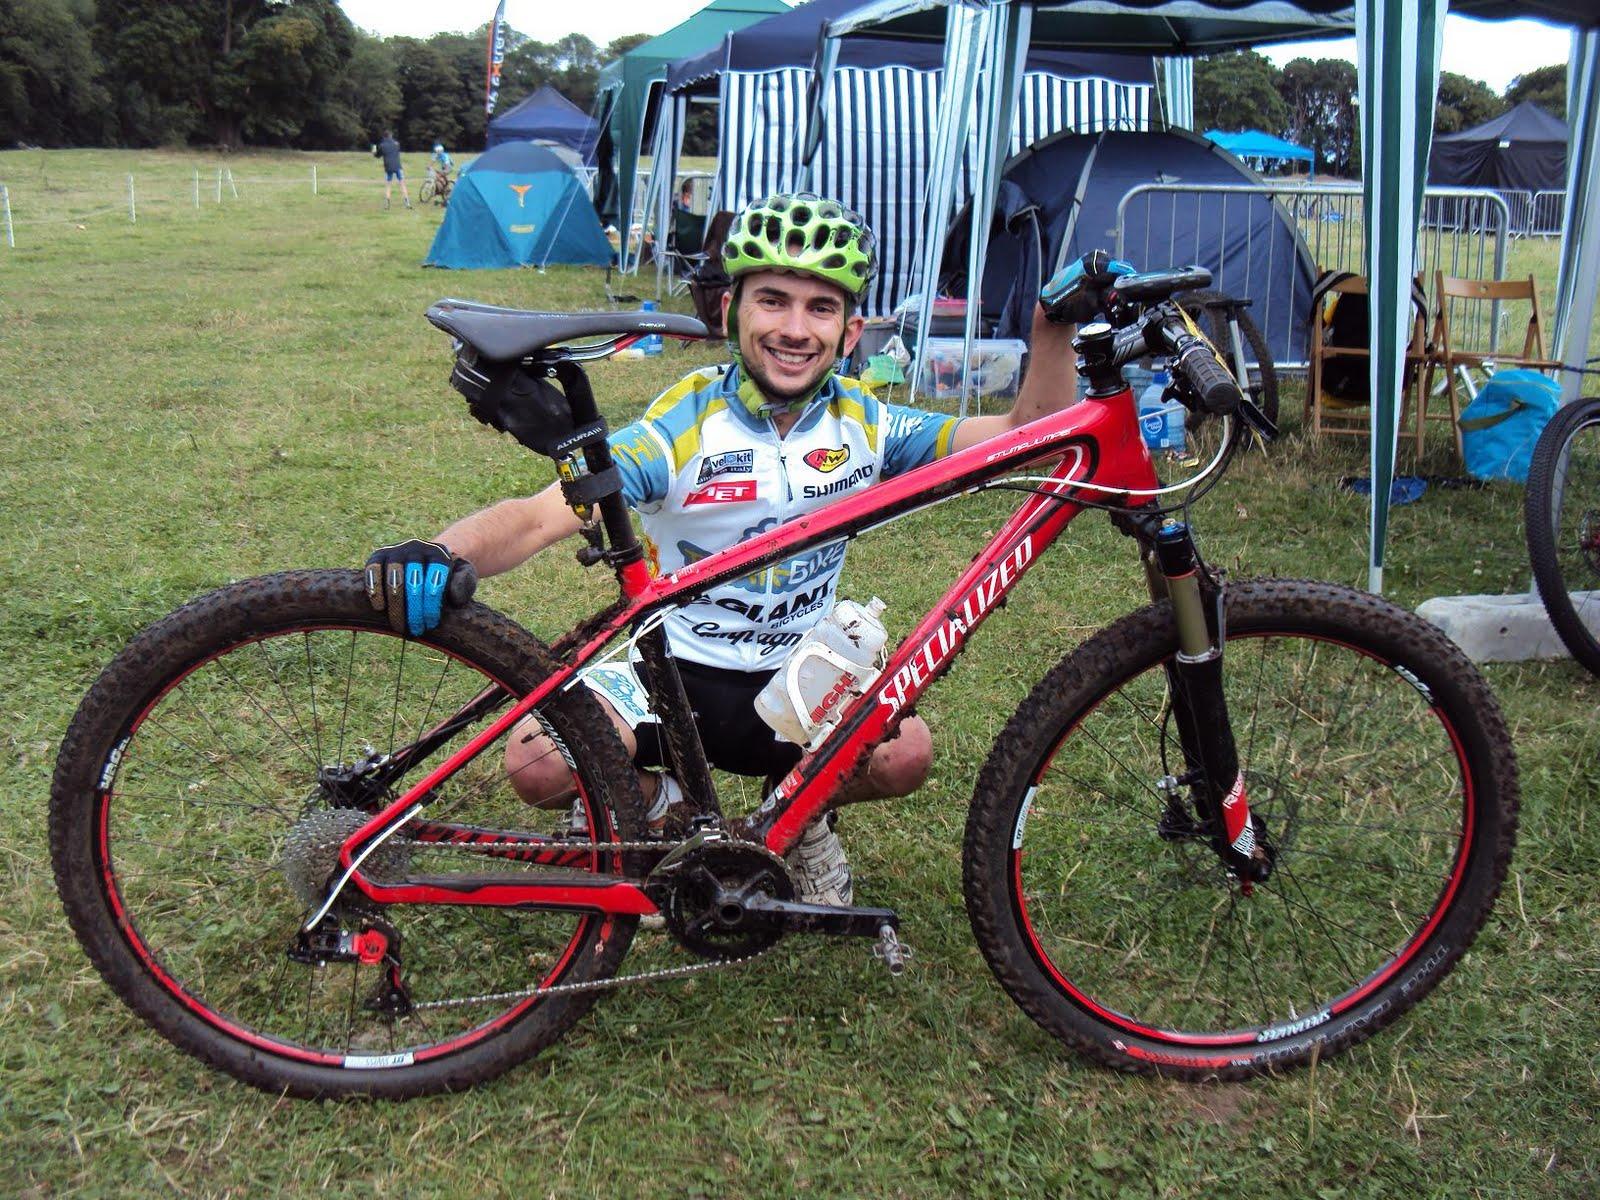 Andras Gercsenyi Xc Mountain Biker Bull Raid 12 Hours Mtb Race